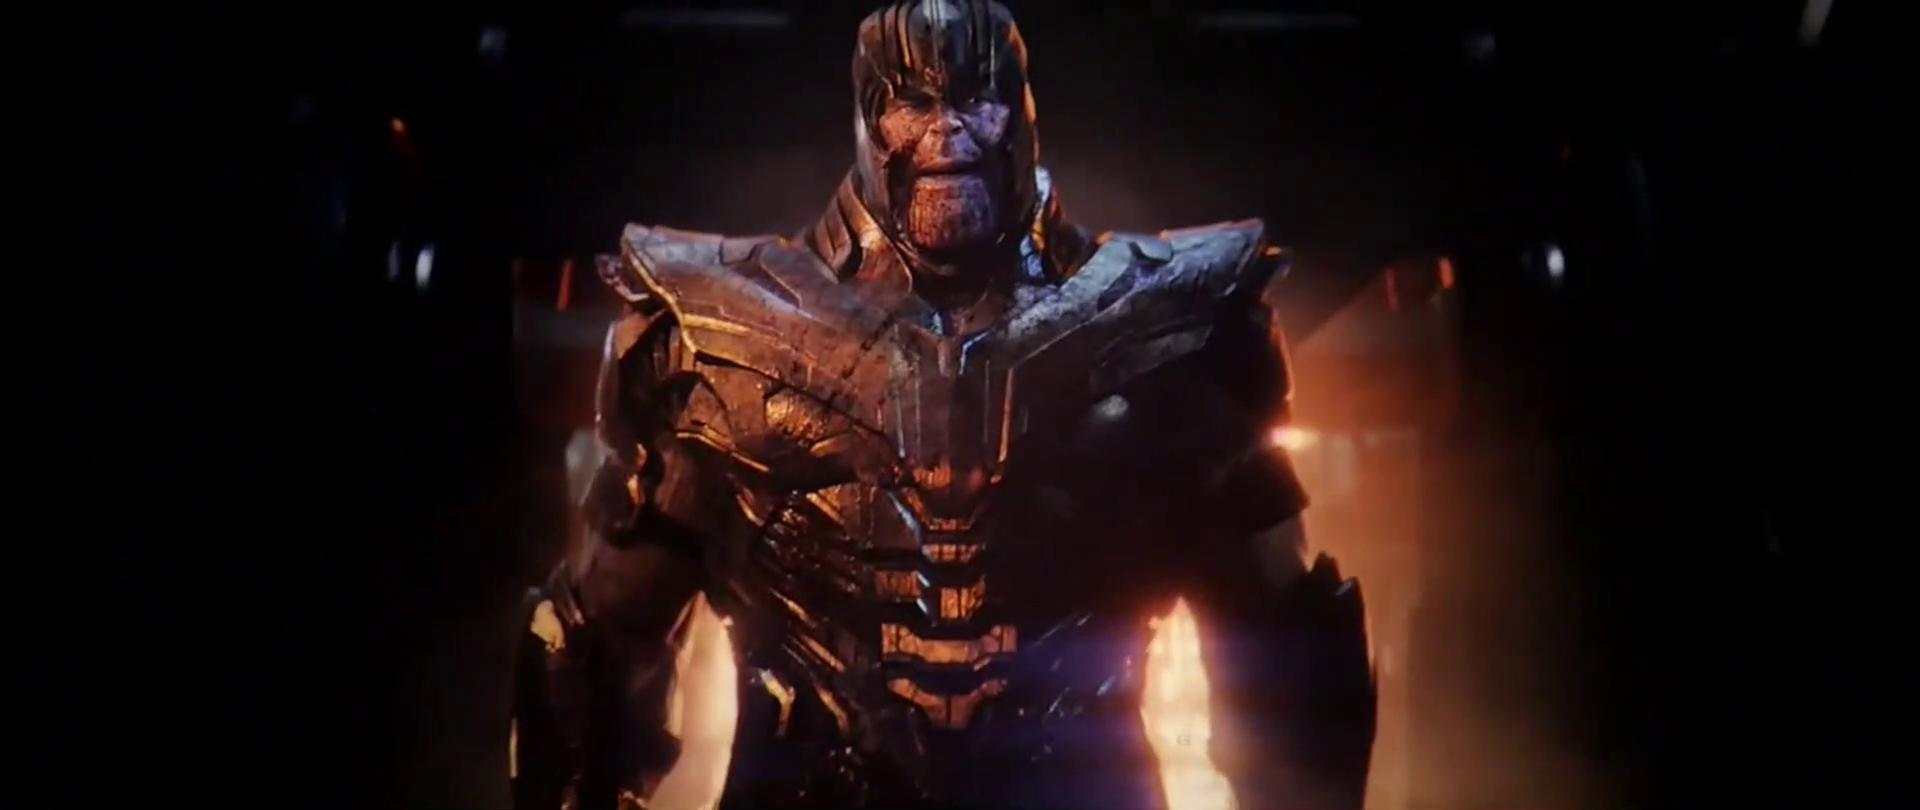 Avengers Endgame 2019 3D 1080p BluRay x264-GUACAMOLE